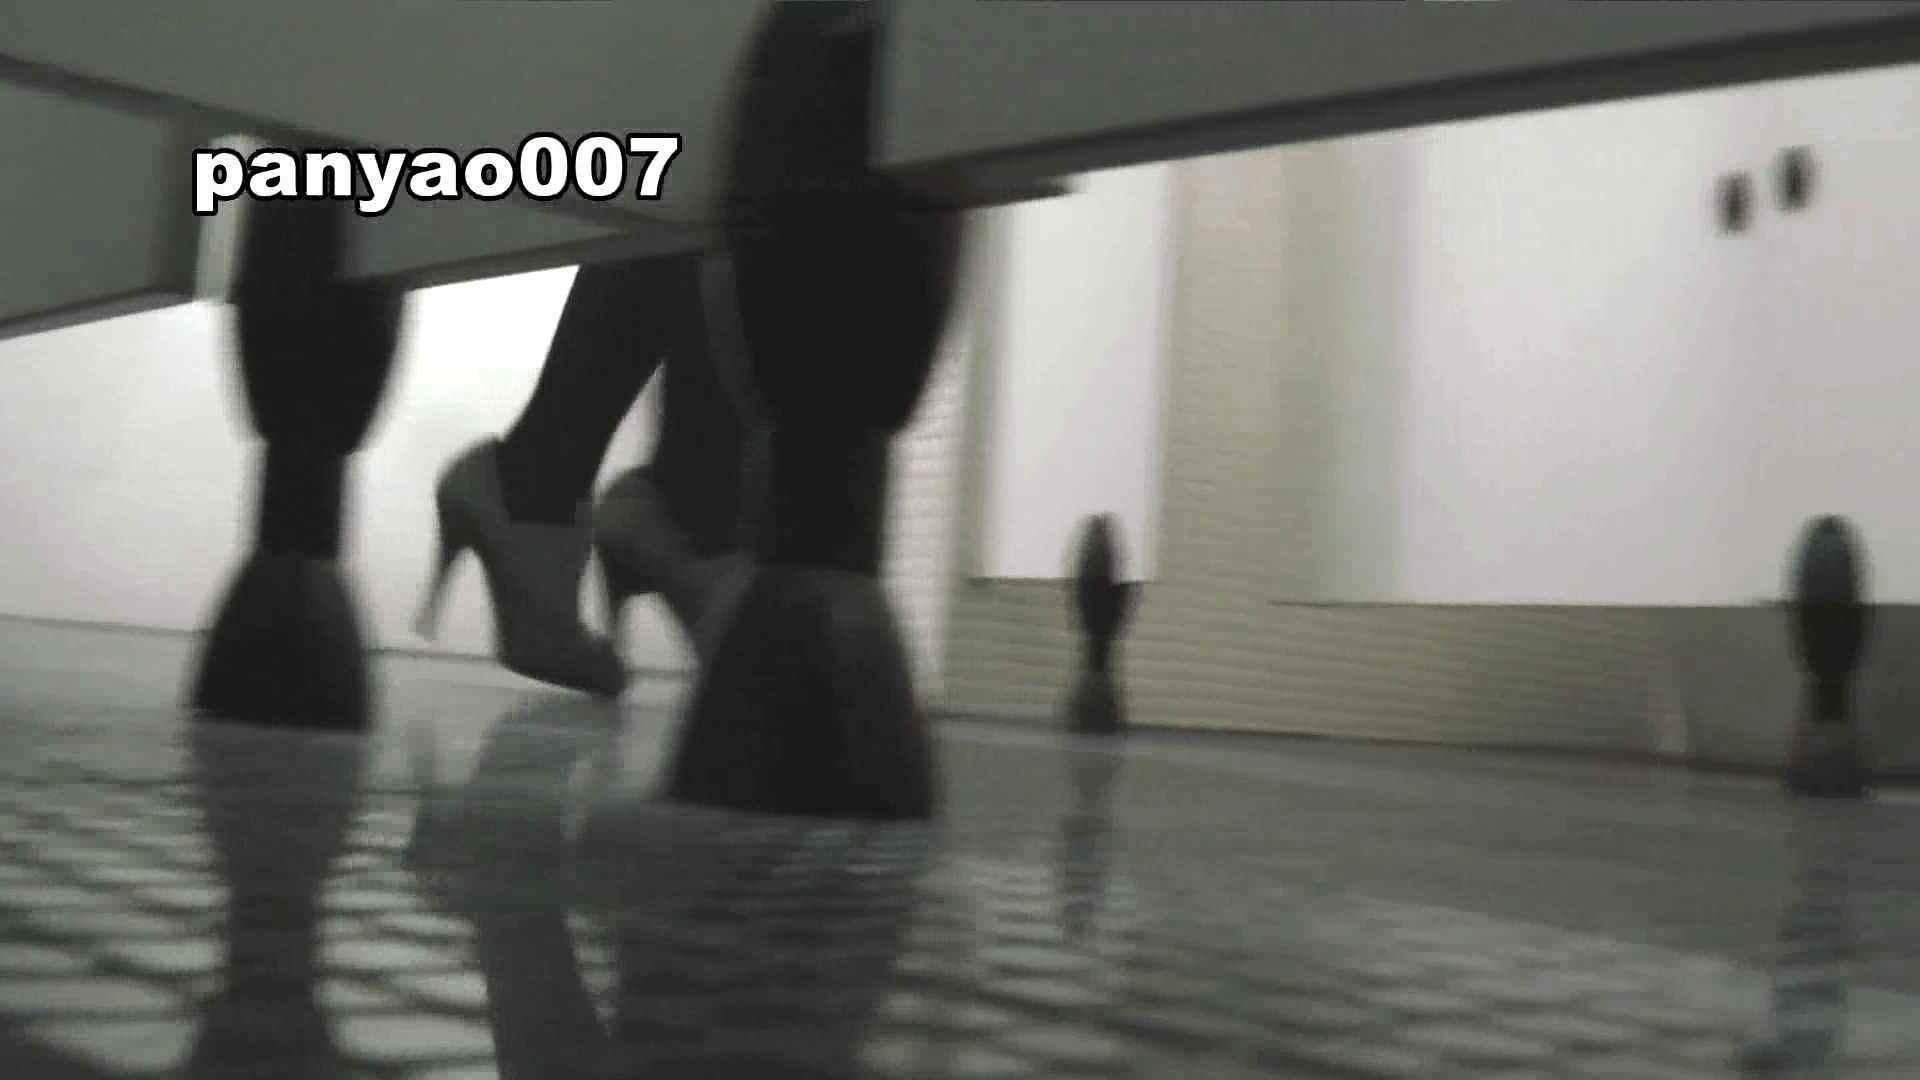 日本成人用品展览会。vol.07 照射実験 着替え 盗撮おめこ無修正動画無料 102連発 56